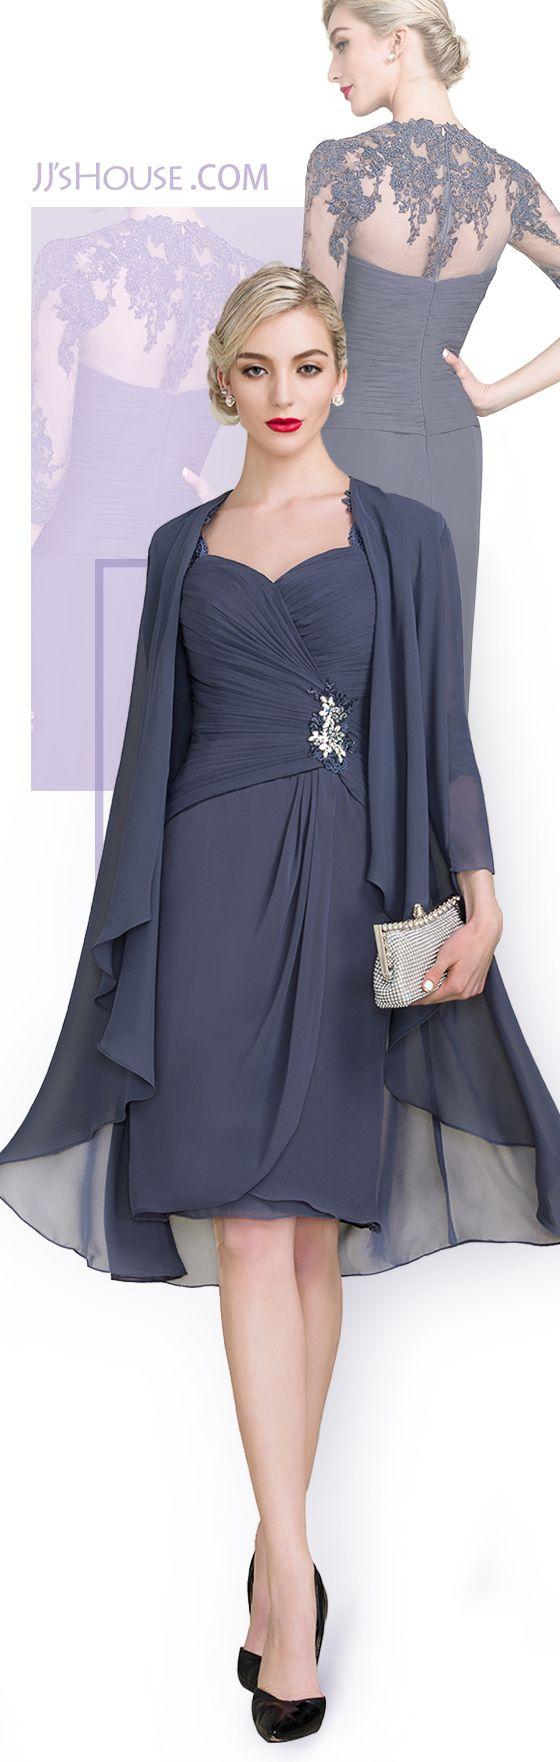 Sheathcolumn kneelength chiffon mother of the bride dress with